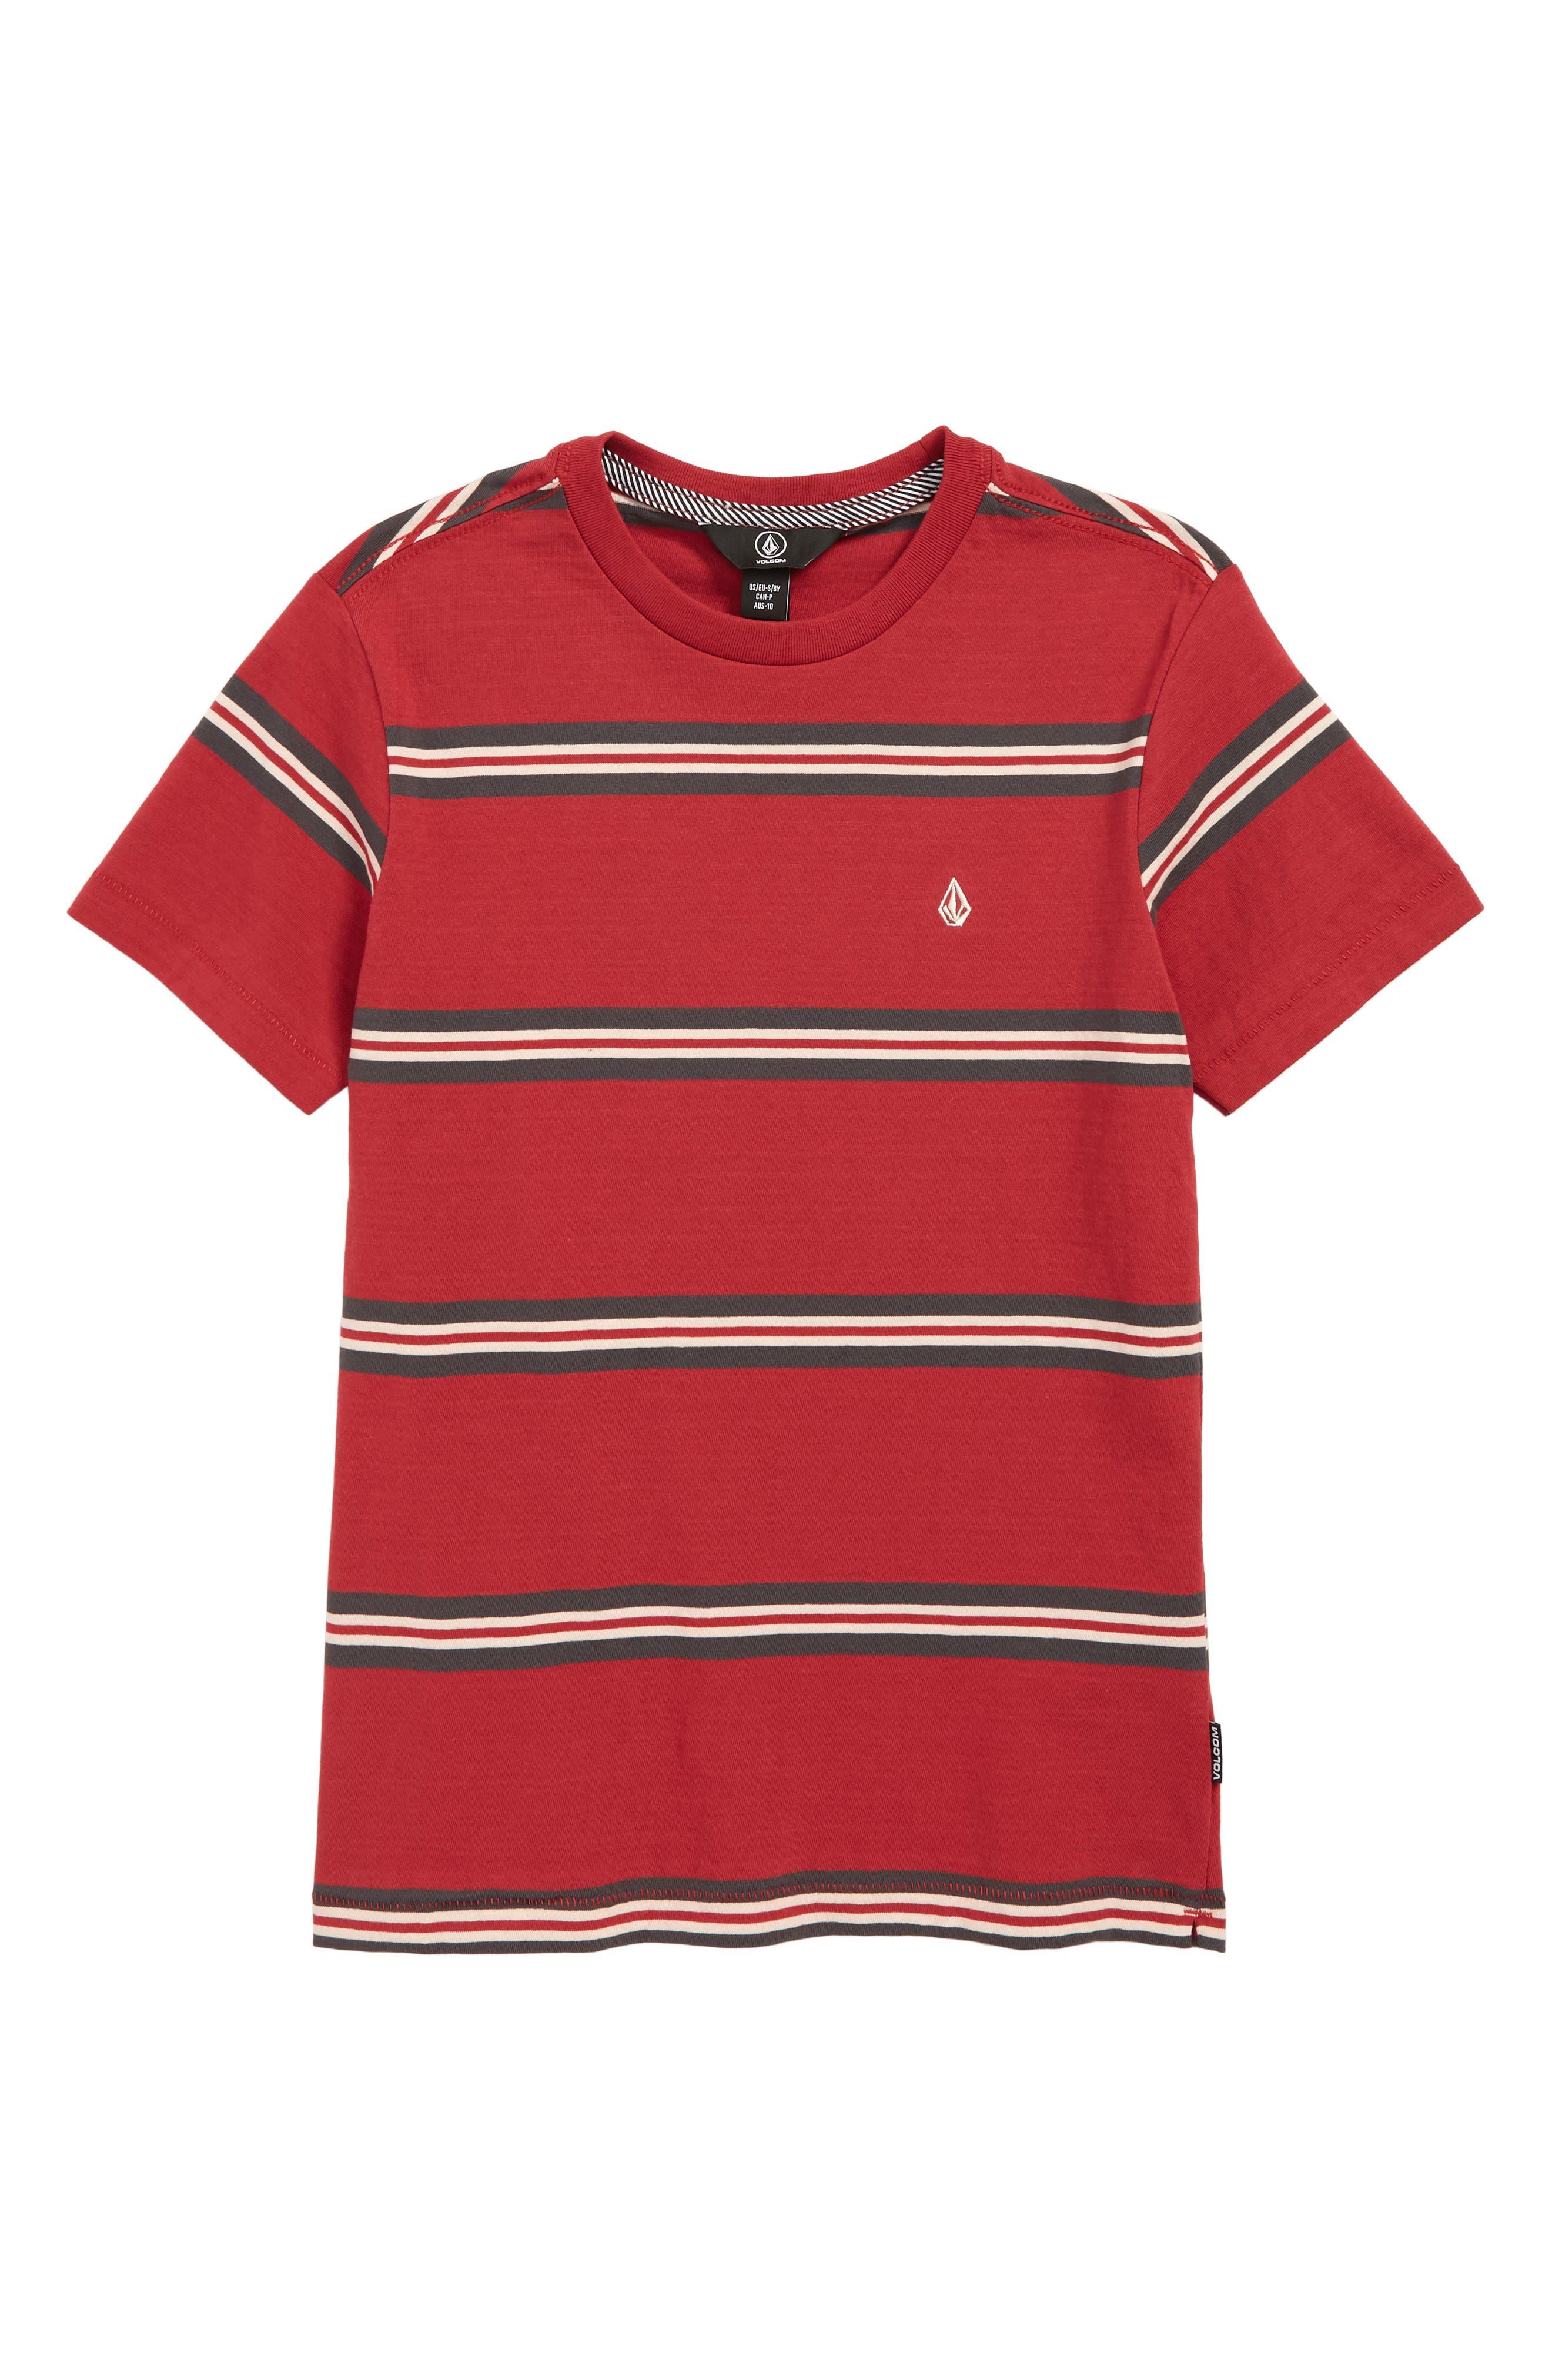 VOLCOM Beauville Stripe T-Shirt, Main, color, BURGUNDY